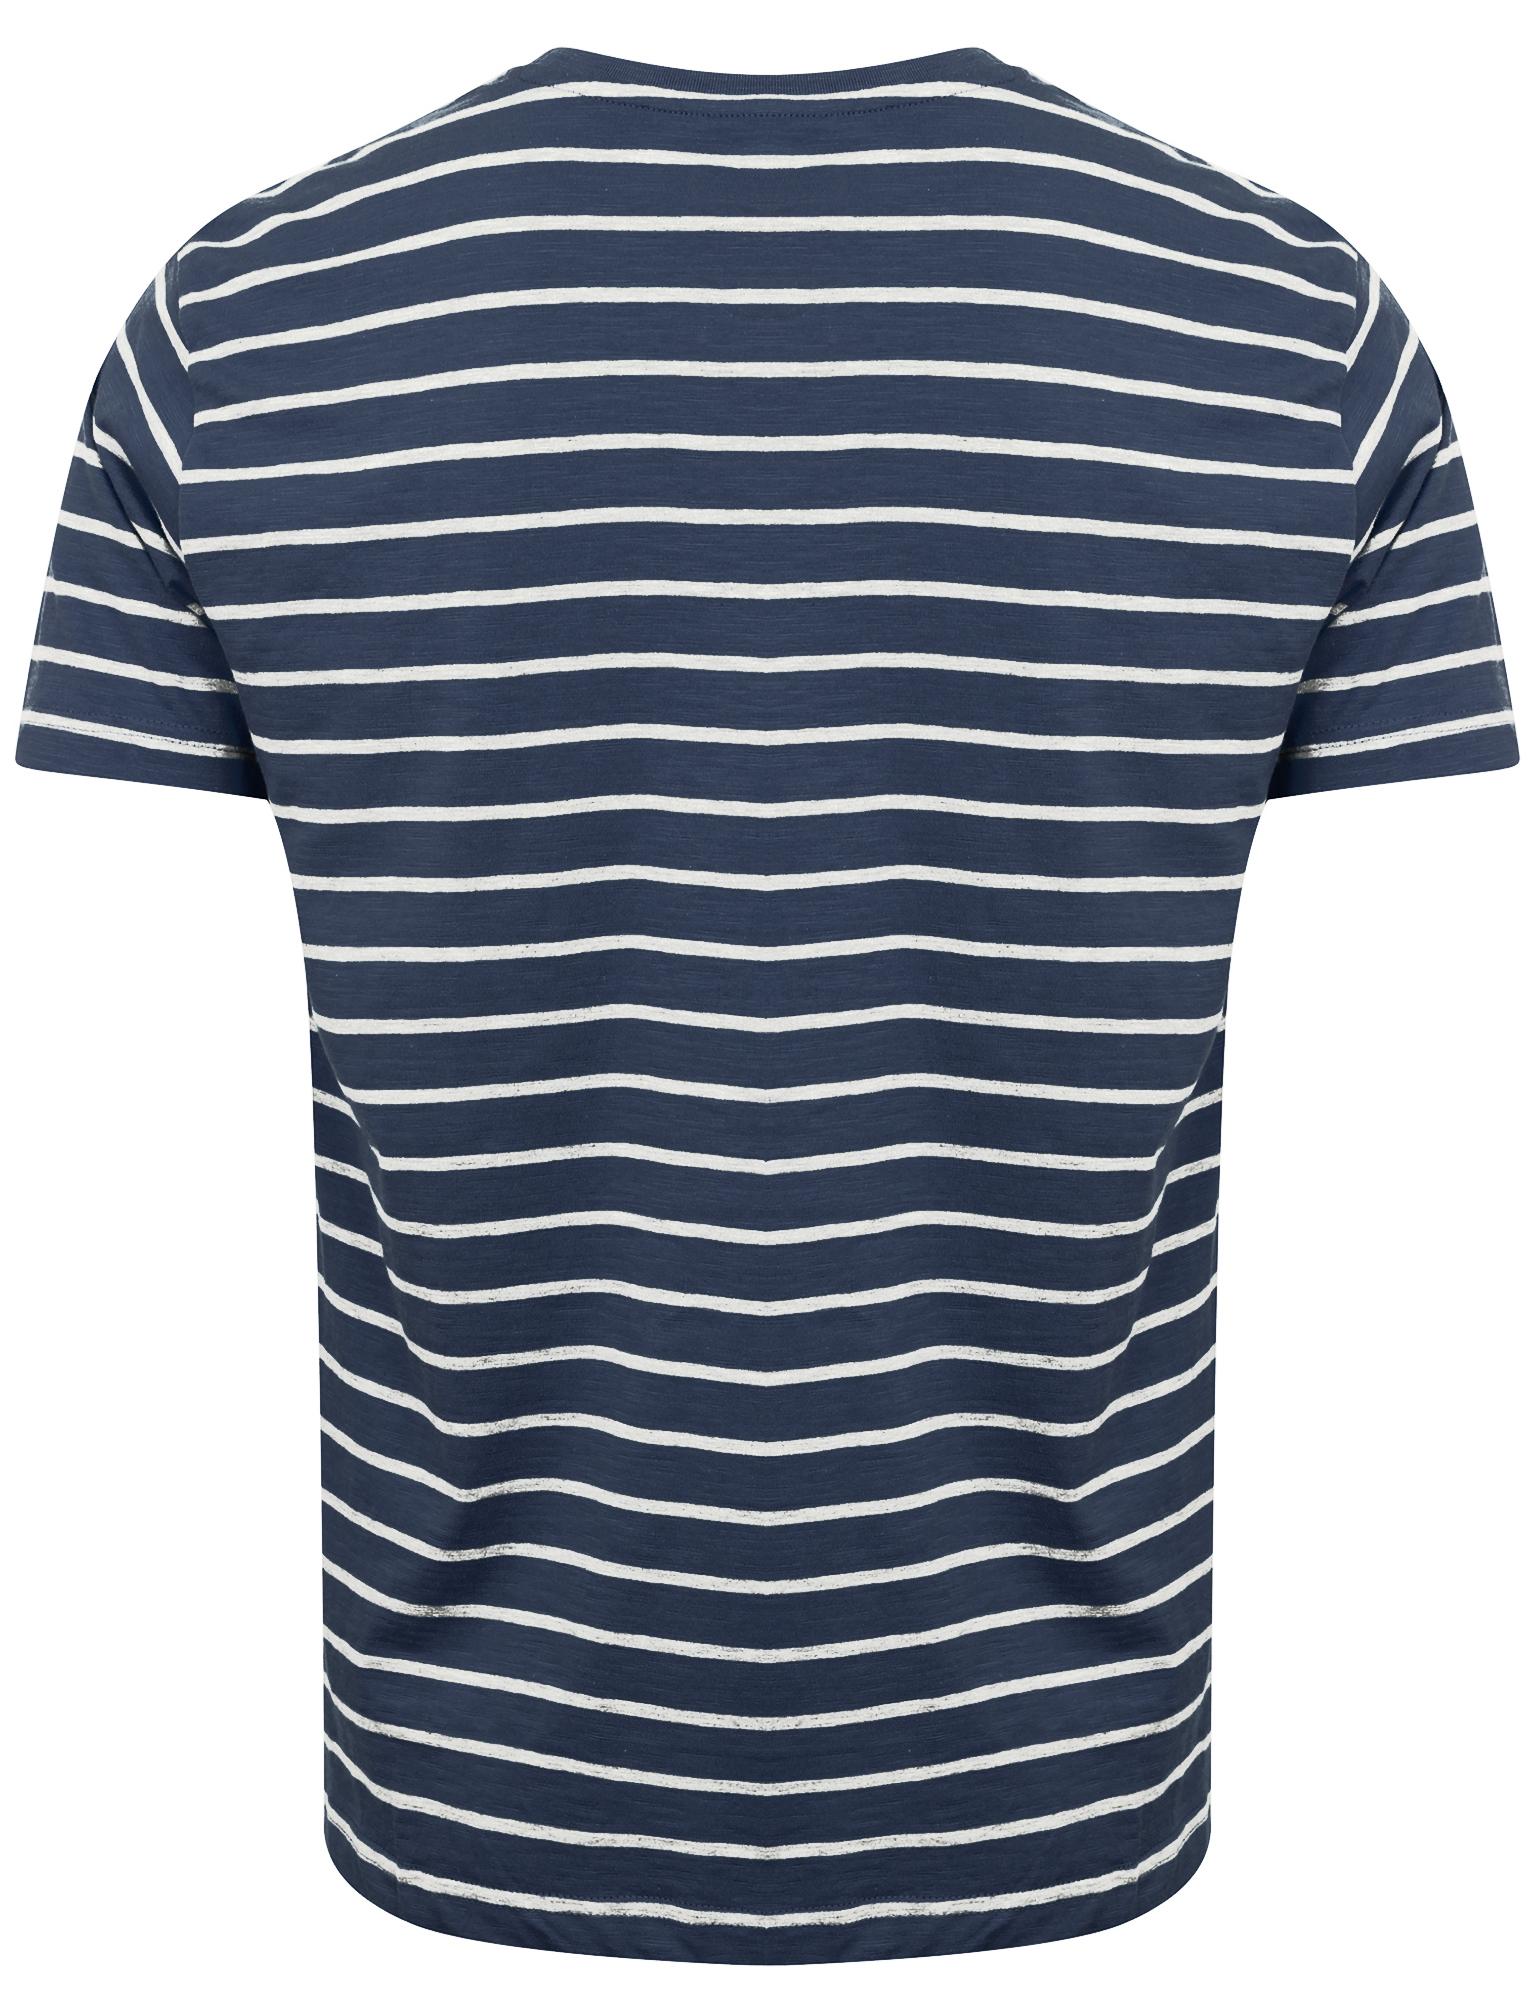 Tokyo-Laundry-Men-039-s-Gough-Cotton-Short-Sleeve-Pyjamas-PJ-Shorts-Lounge-Wear-Set thumbnail 4